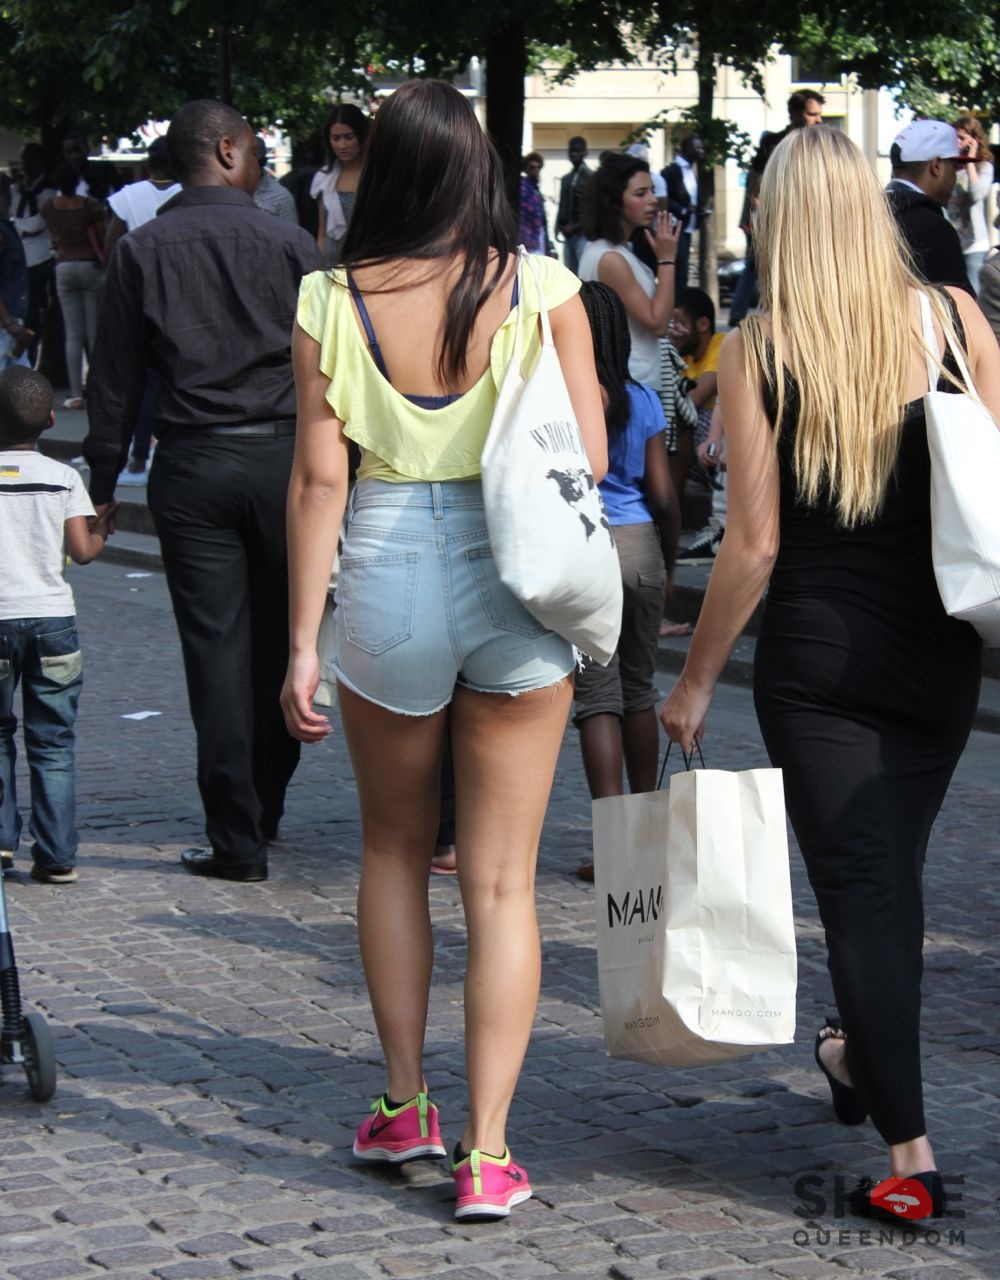 Parisian Street Style By ShoeQUEENDOM - 06.jpg